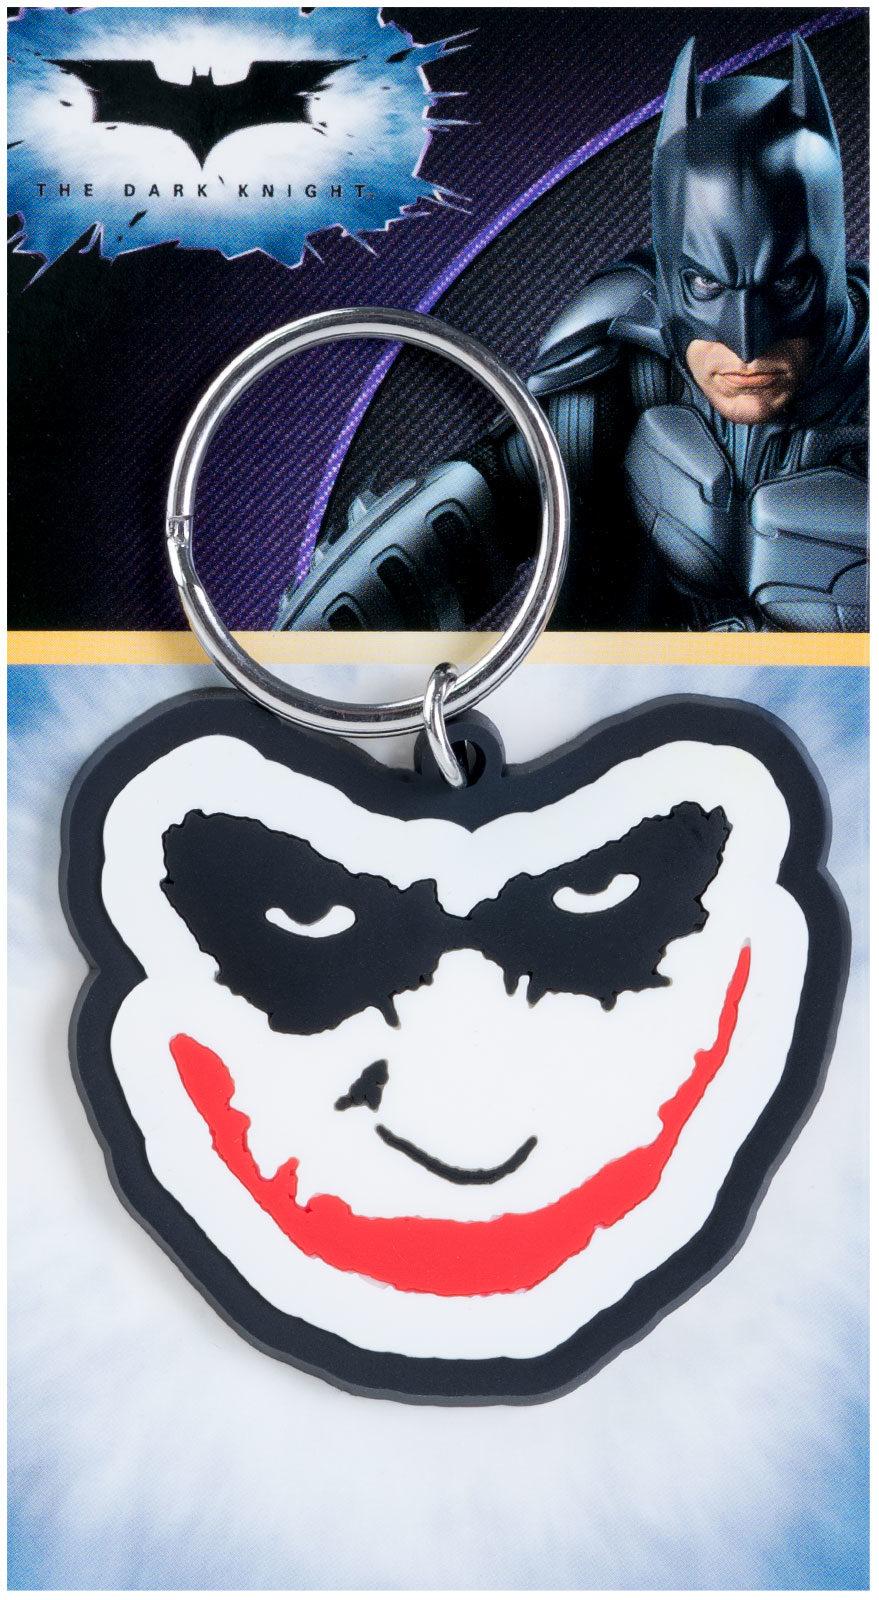 Batman Joker Smile - brelok filmowy na klucze